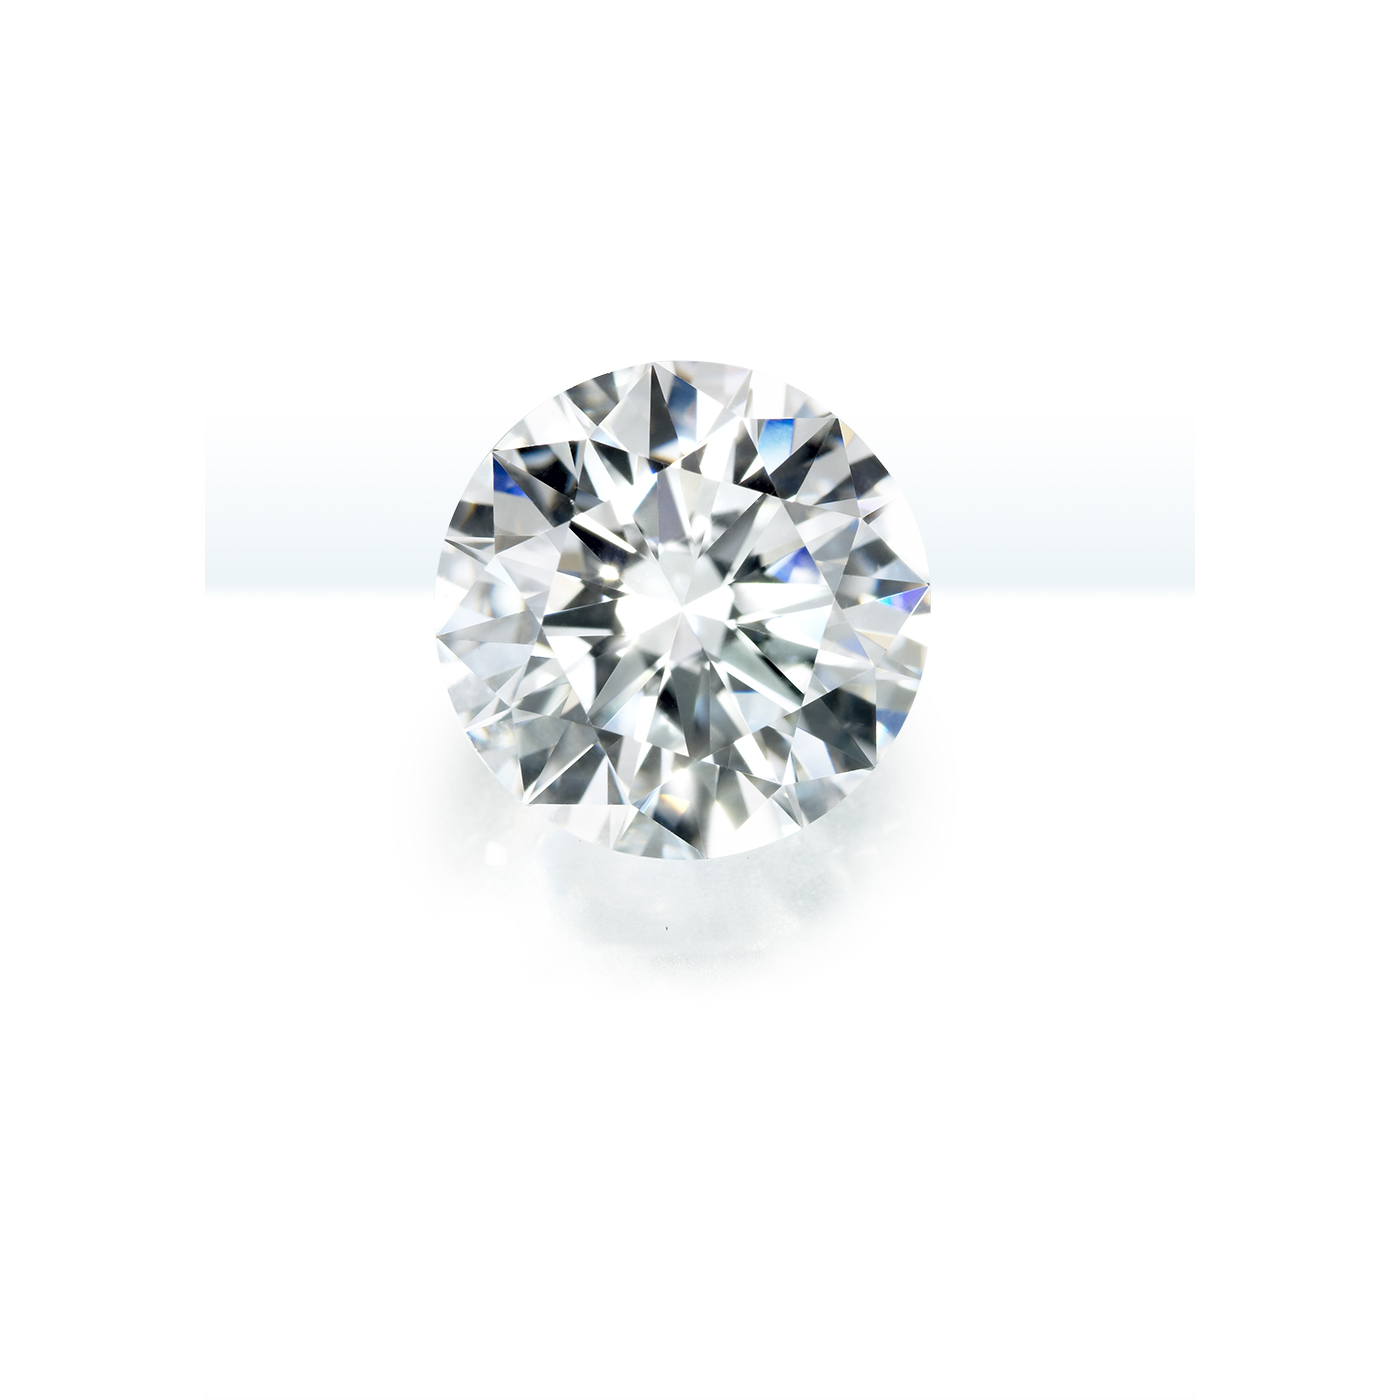 2ct Round Brilliant Cut Diamond.jpg